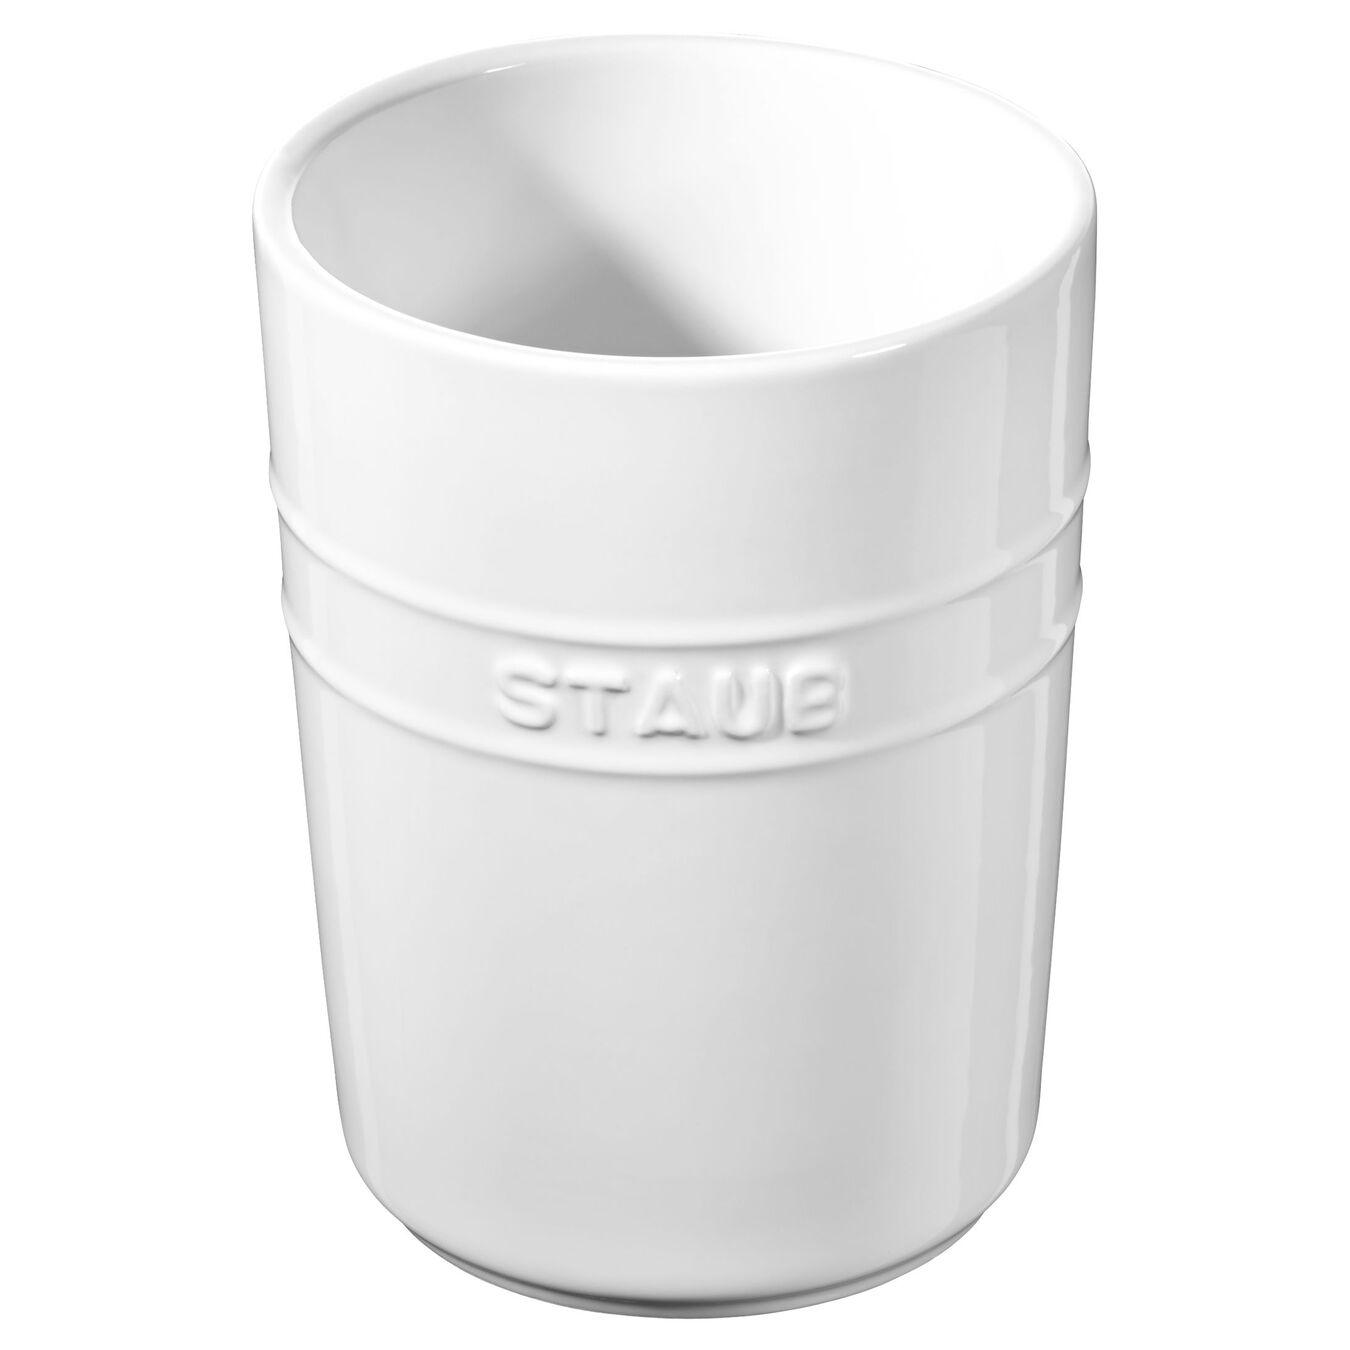 15 cm Ceramic Utensil holder, Pure-White,,large 1